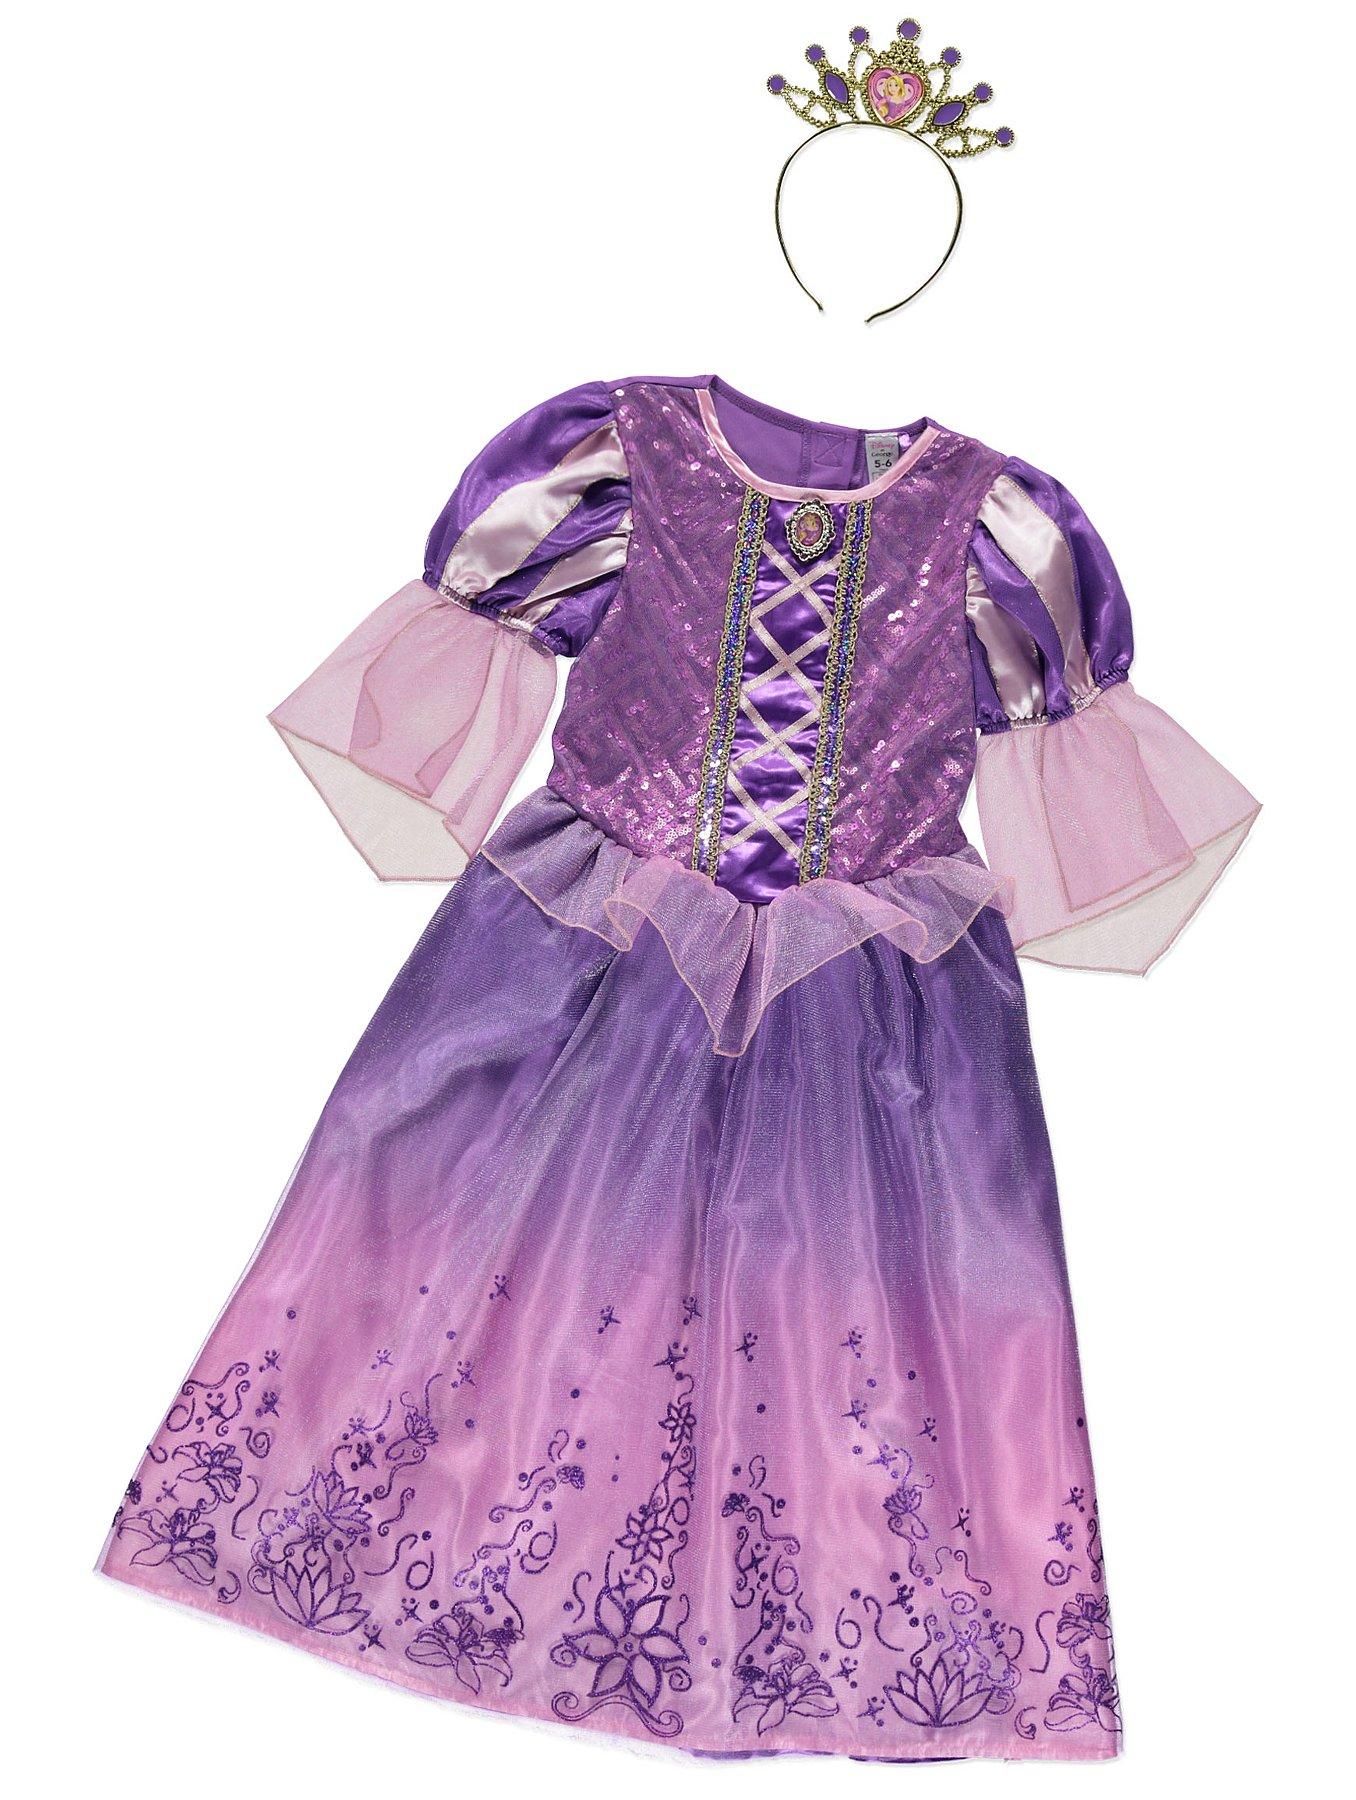 Disney Princess Rapunzel Fancy Dress Costume | Kids | George at ASDA